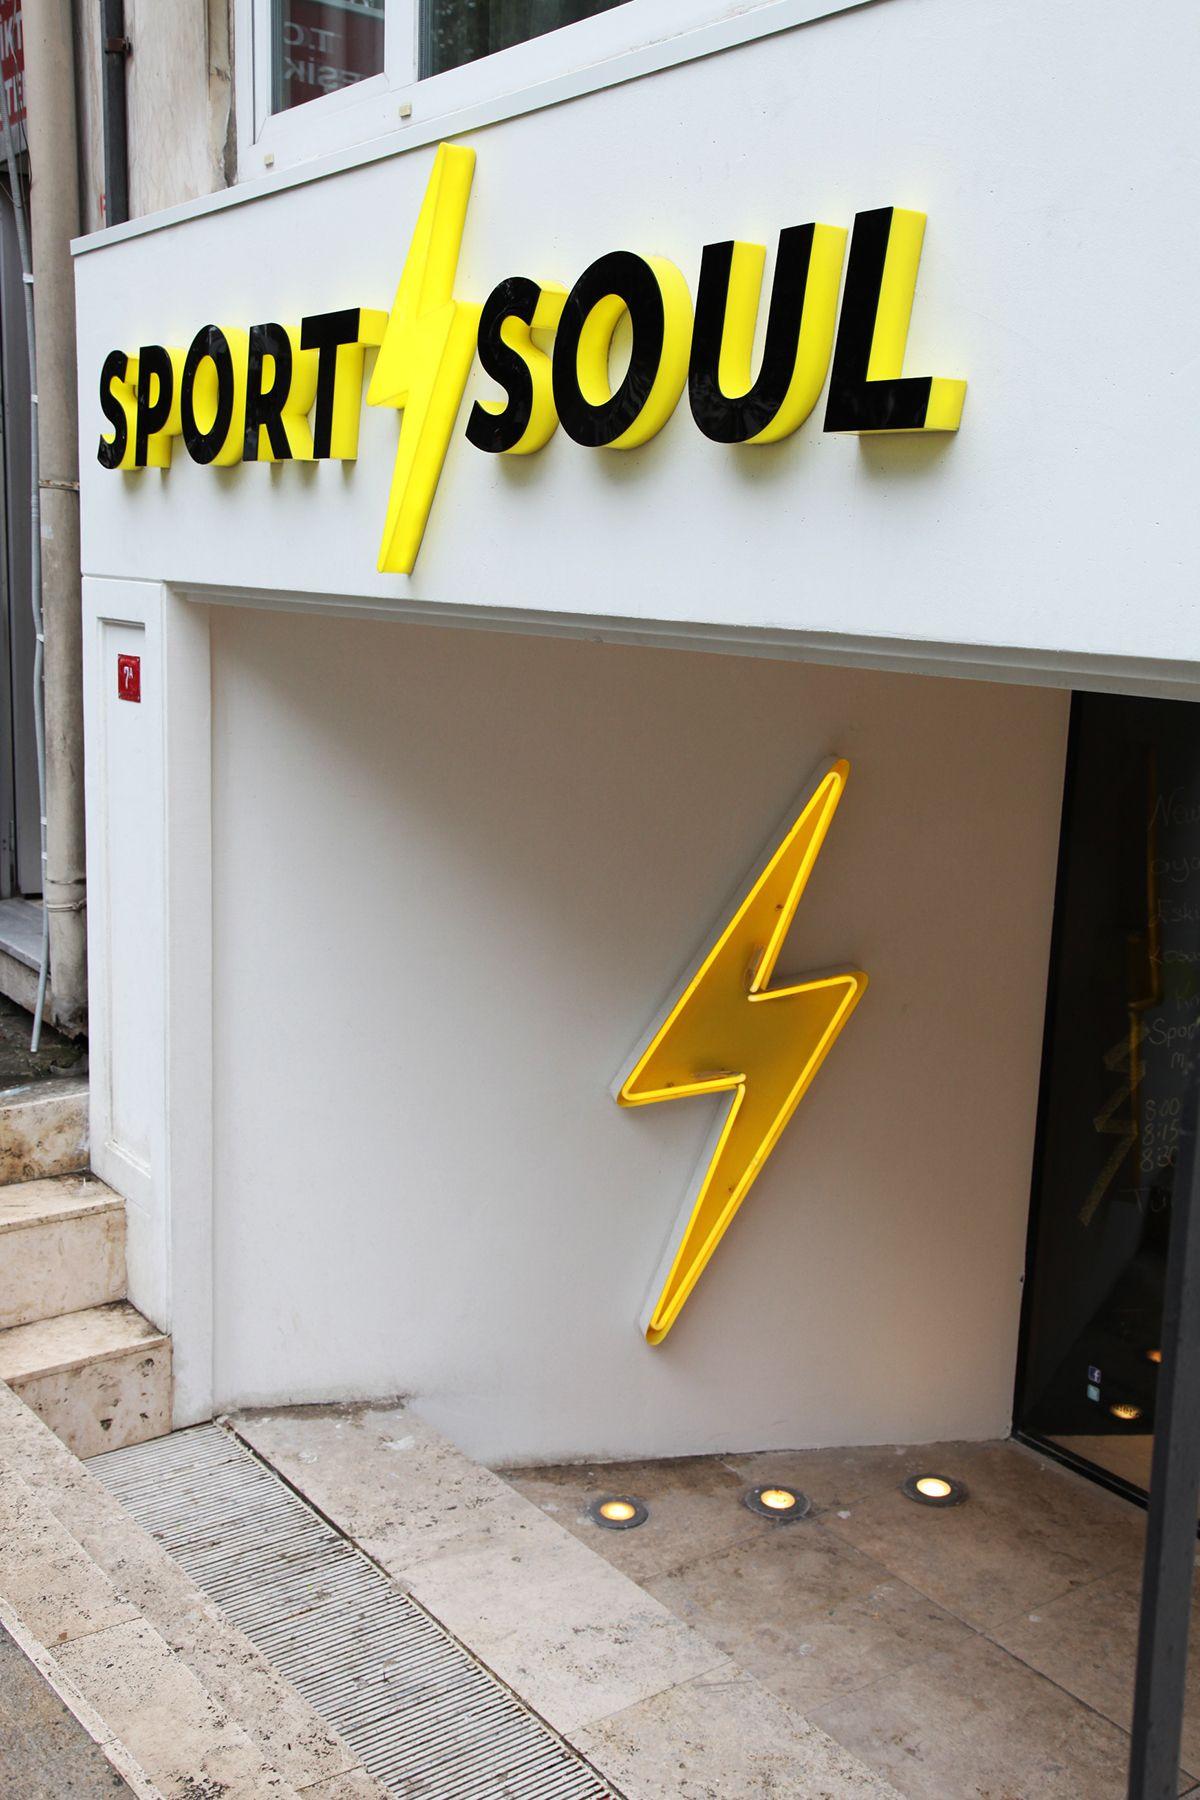 Exterior and interior store design ideas for Sport Soul. Branding ...